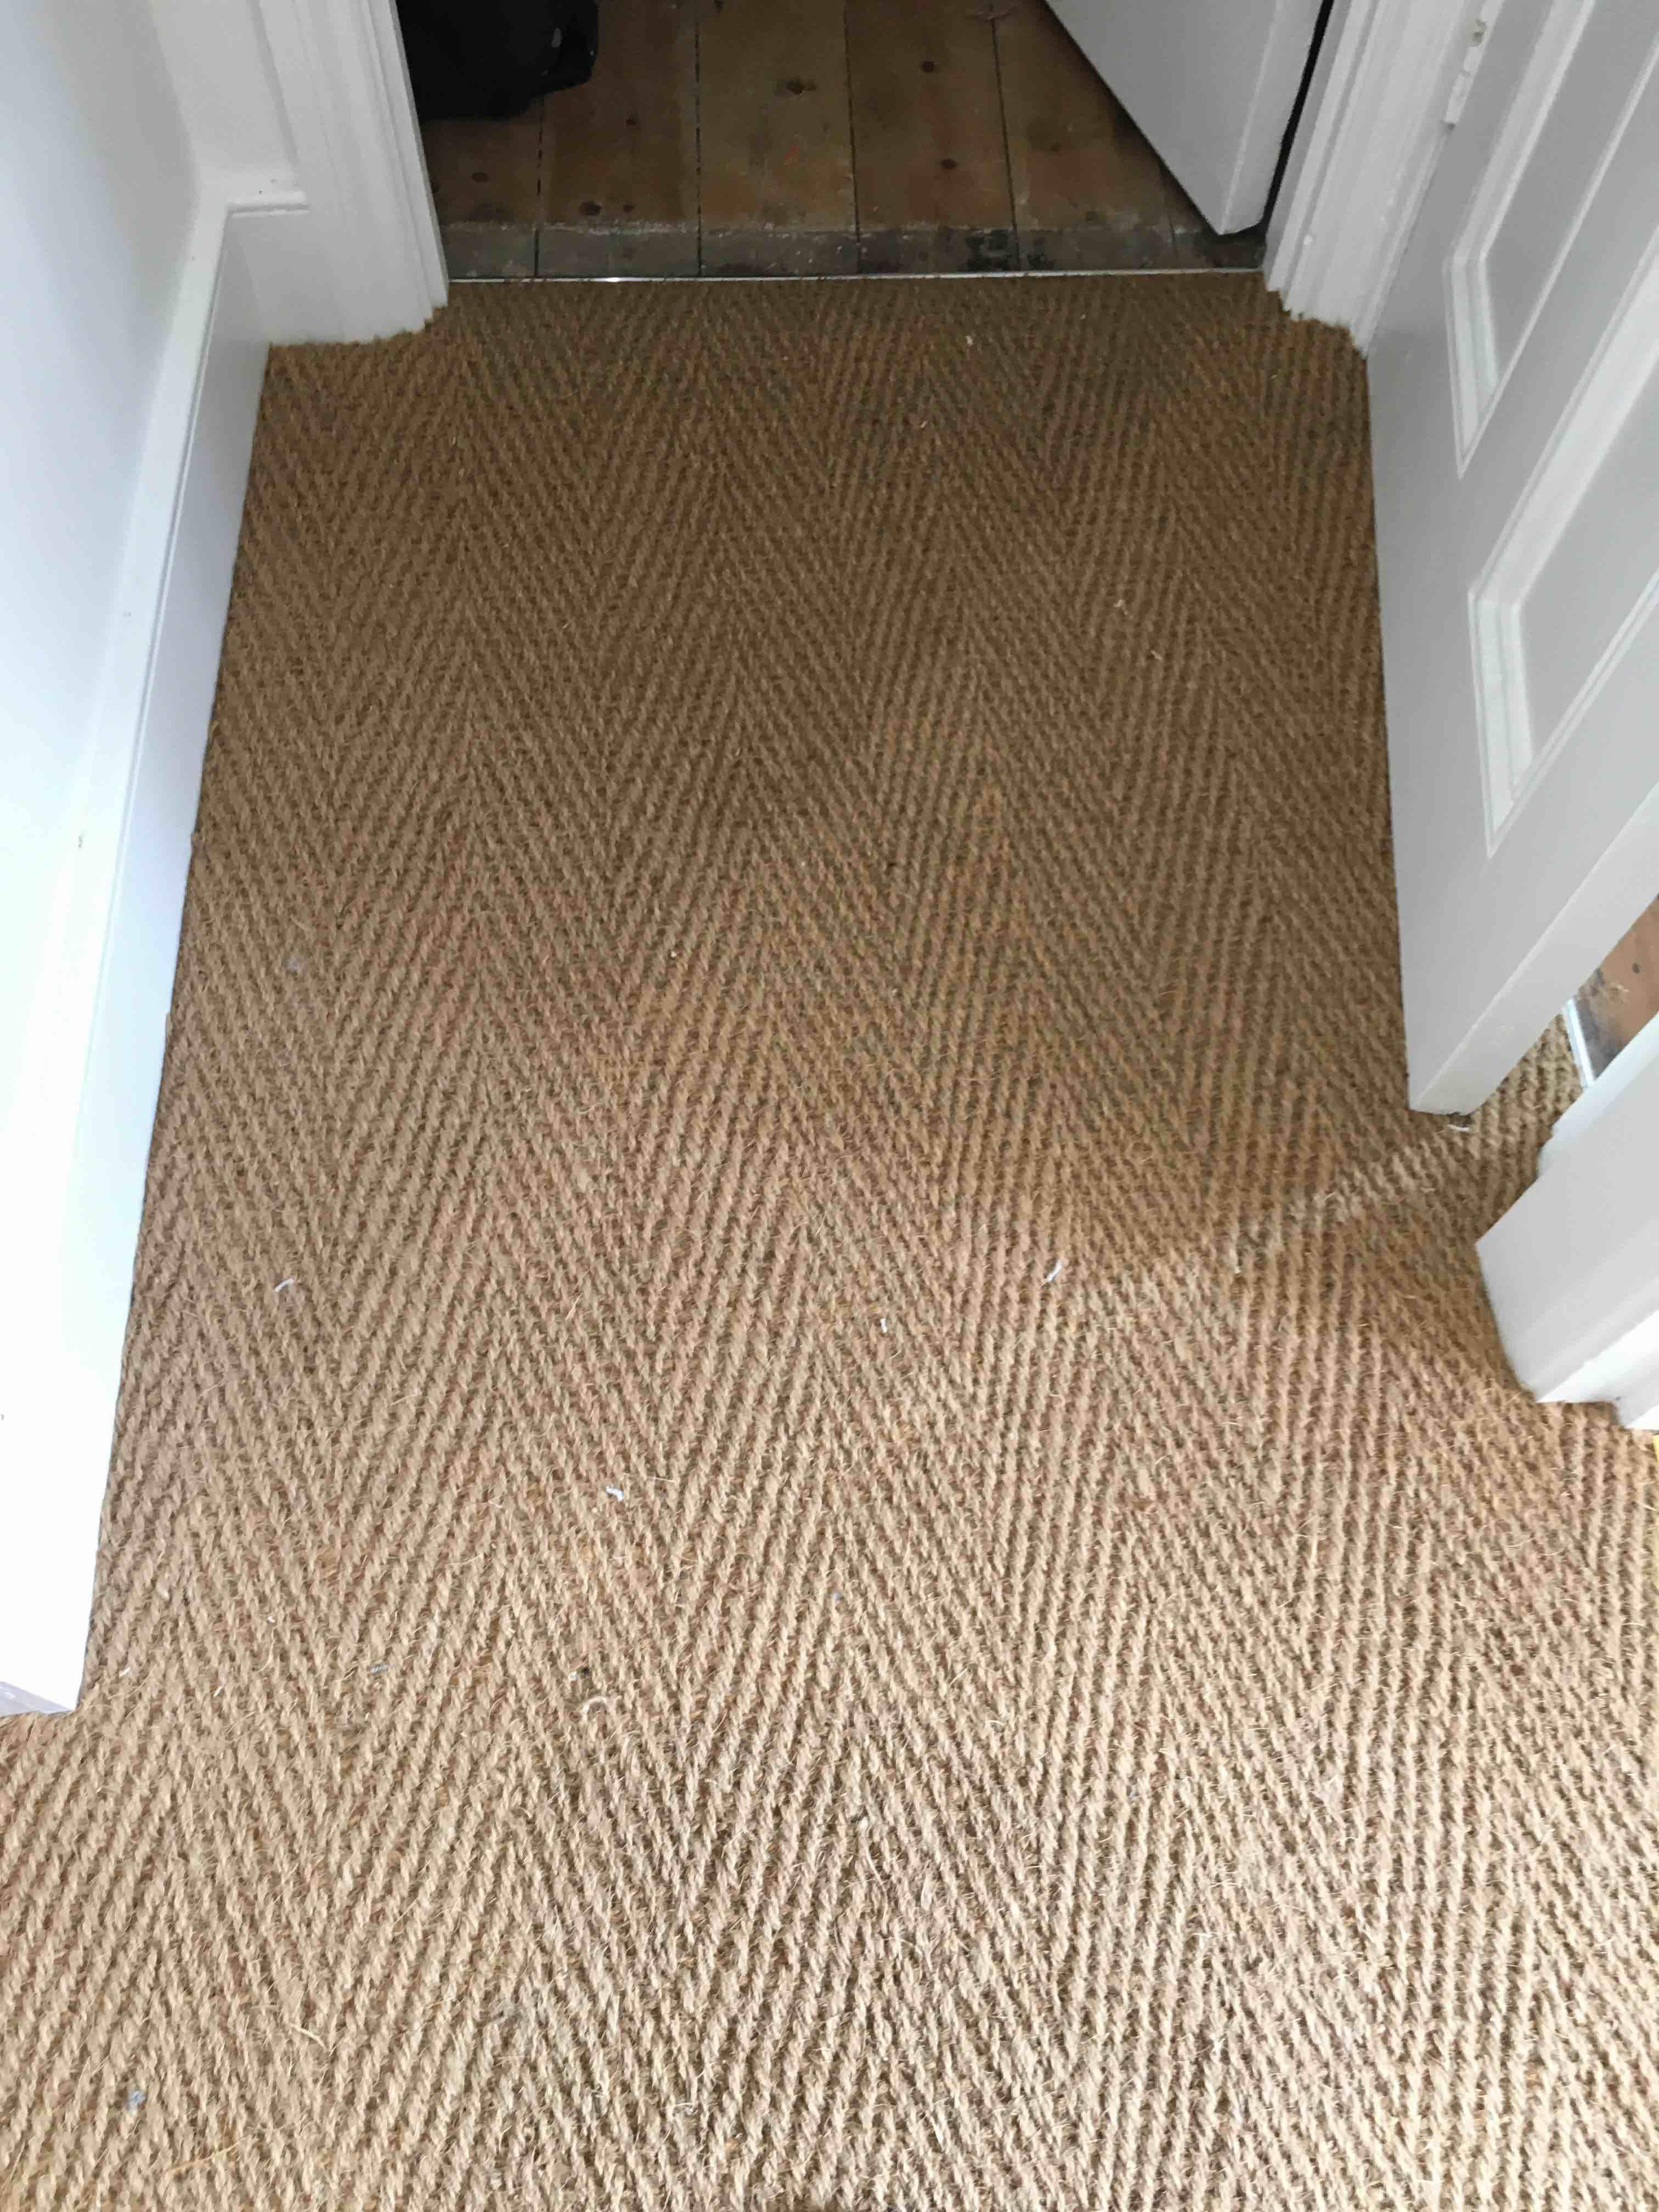 Buy Coir Carpet